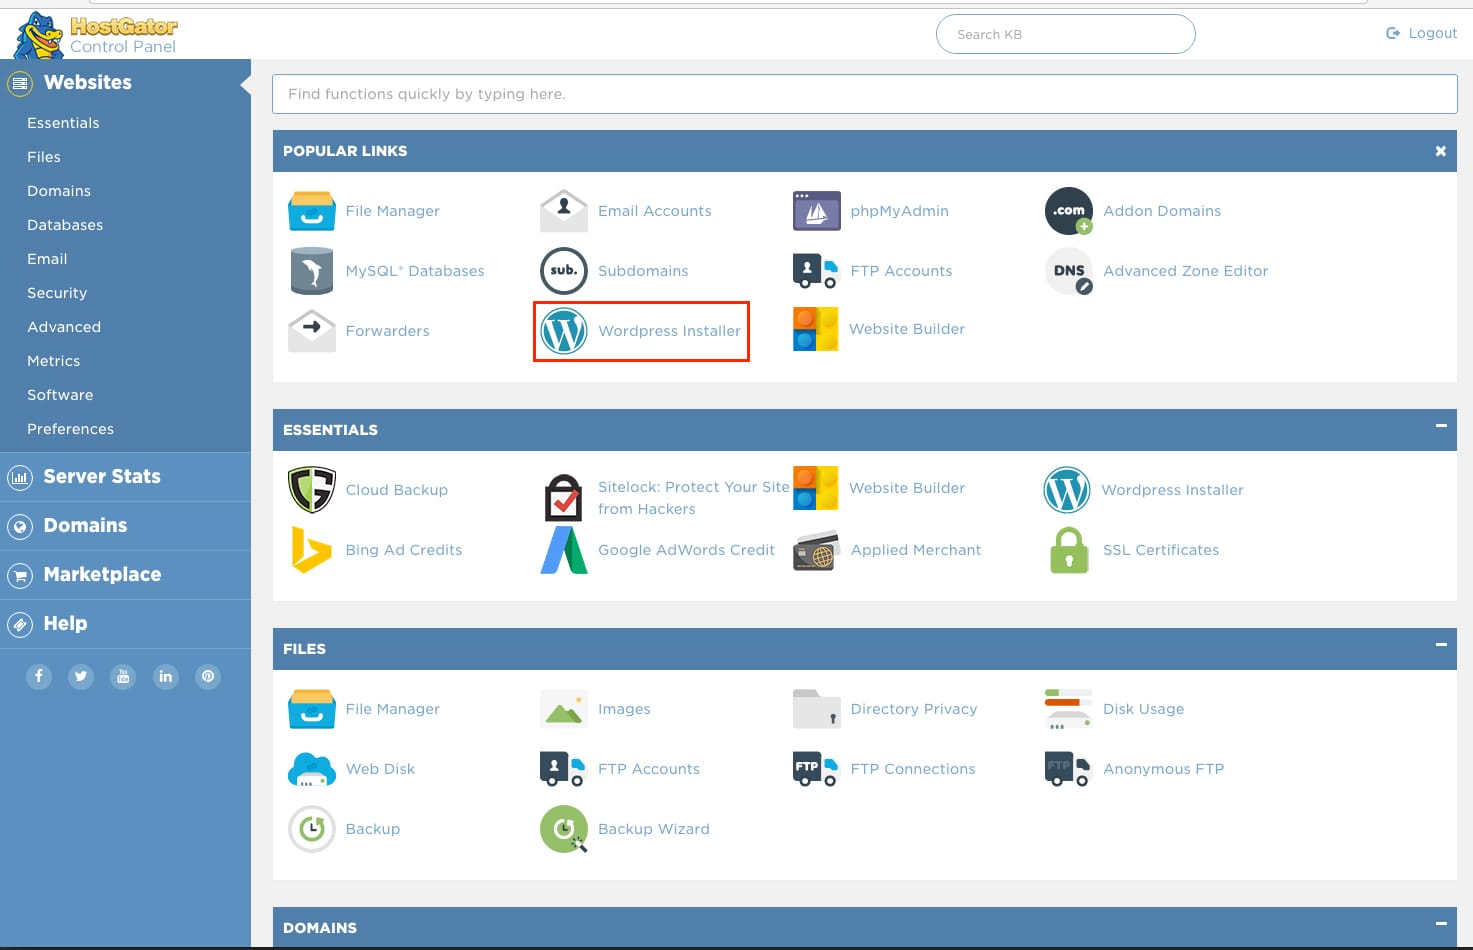 Install WordPress with Hostgator cPanel